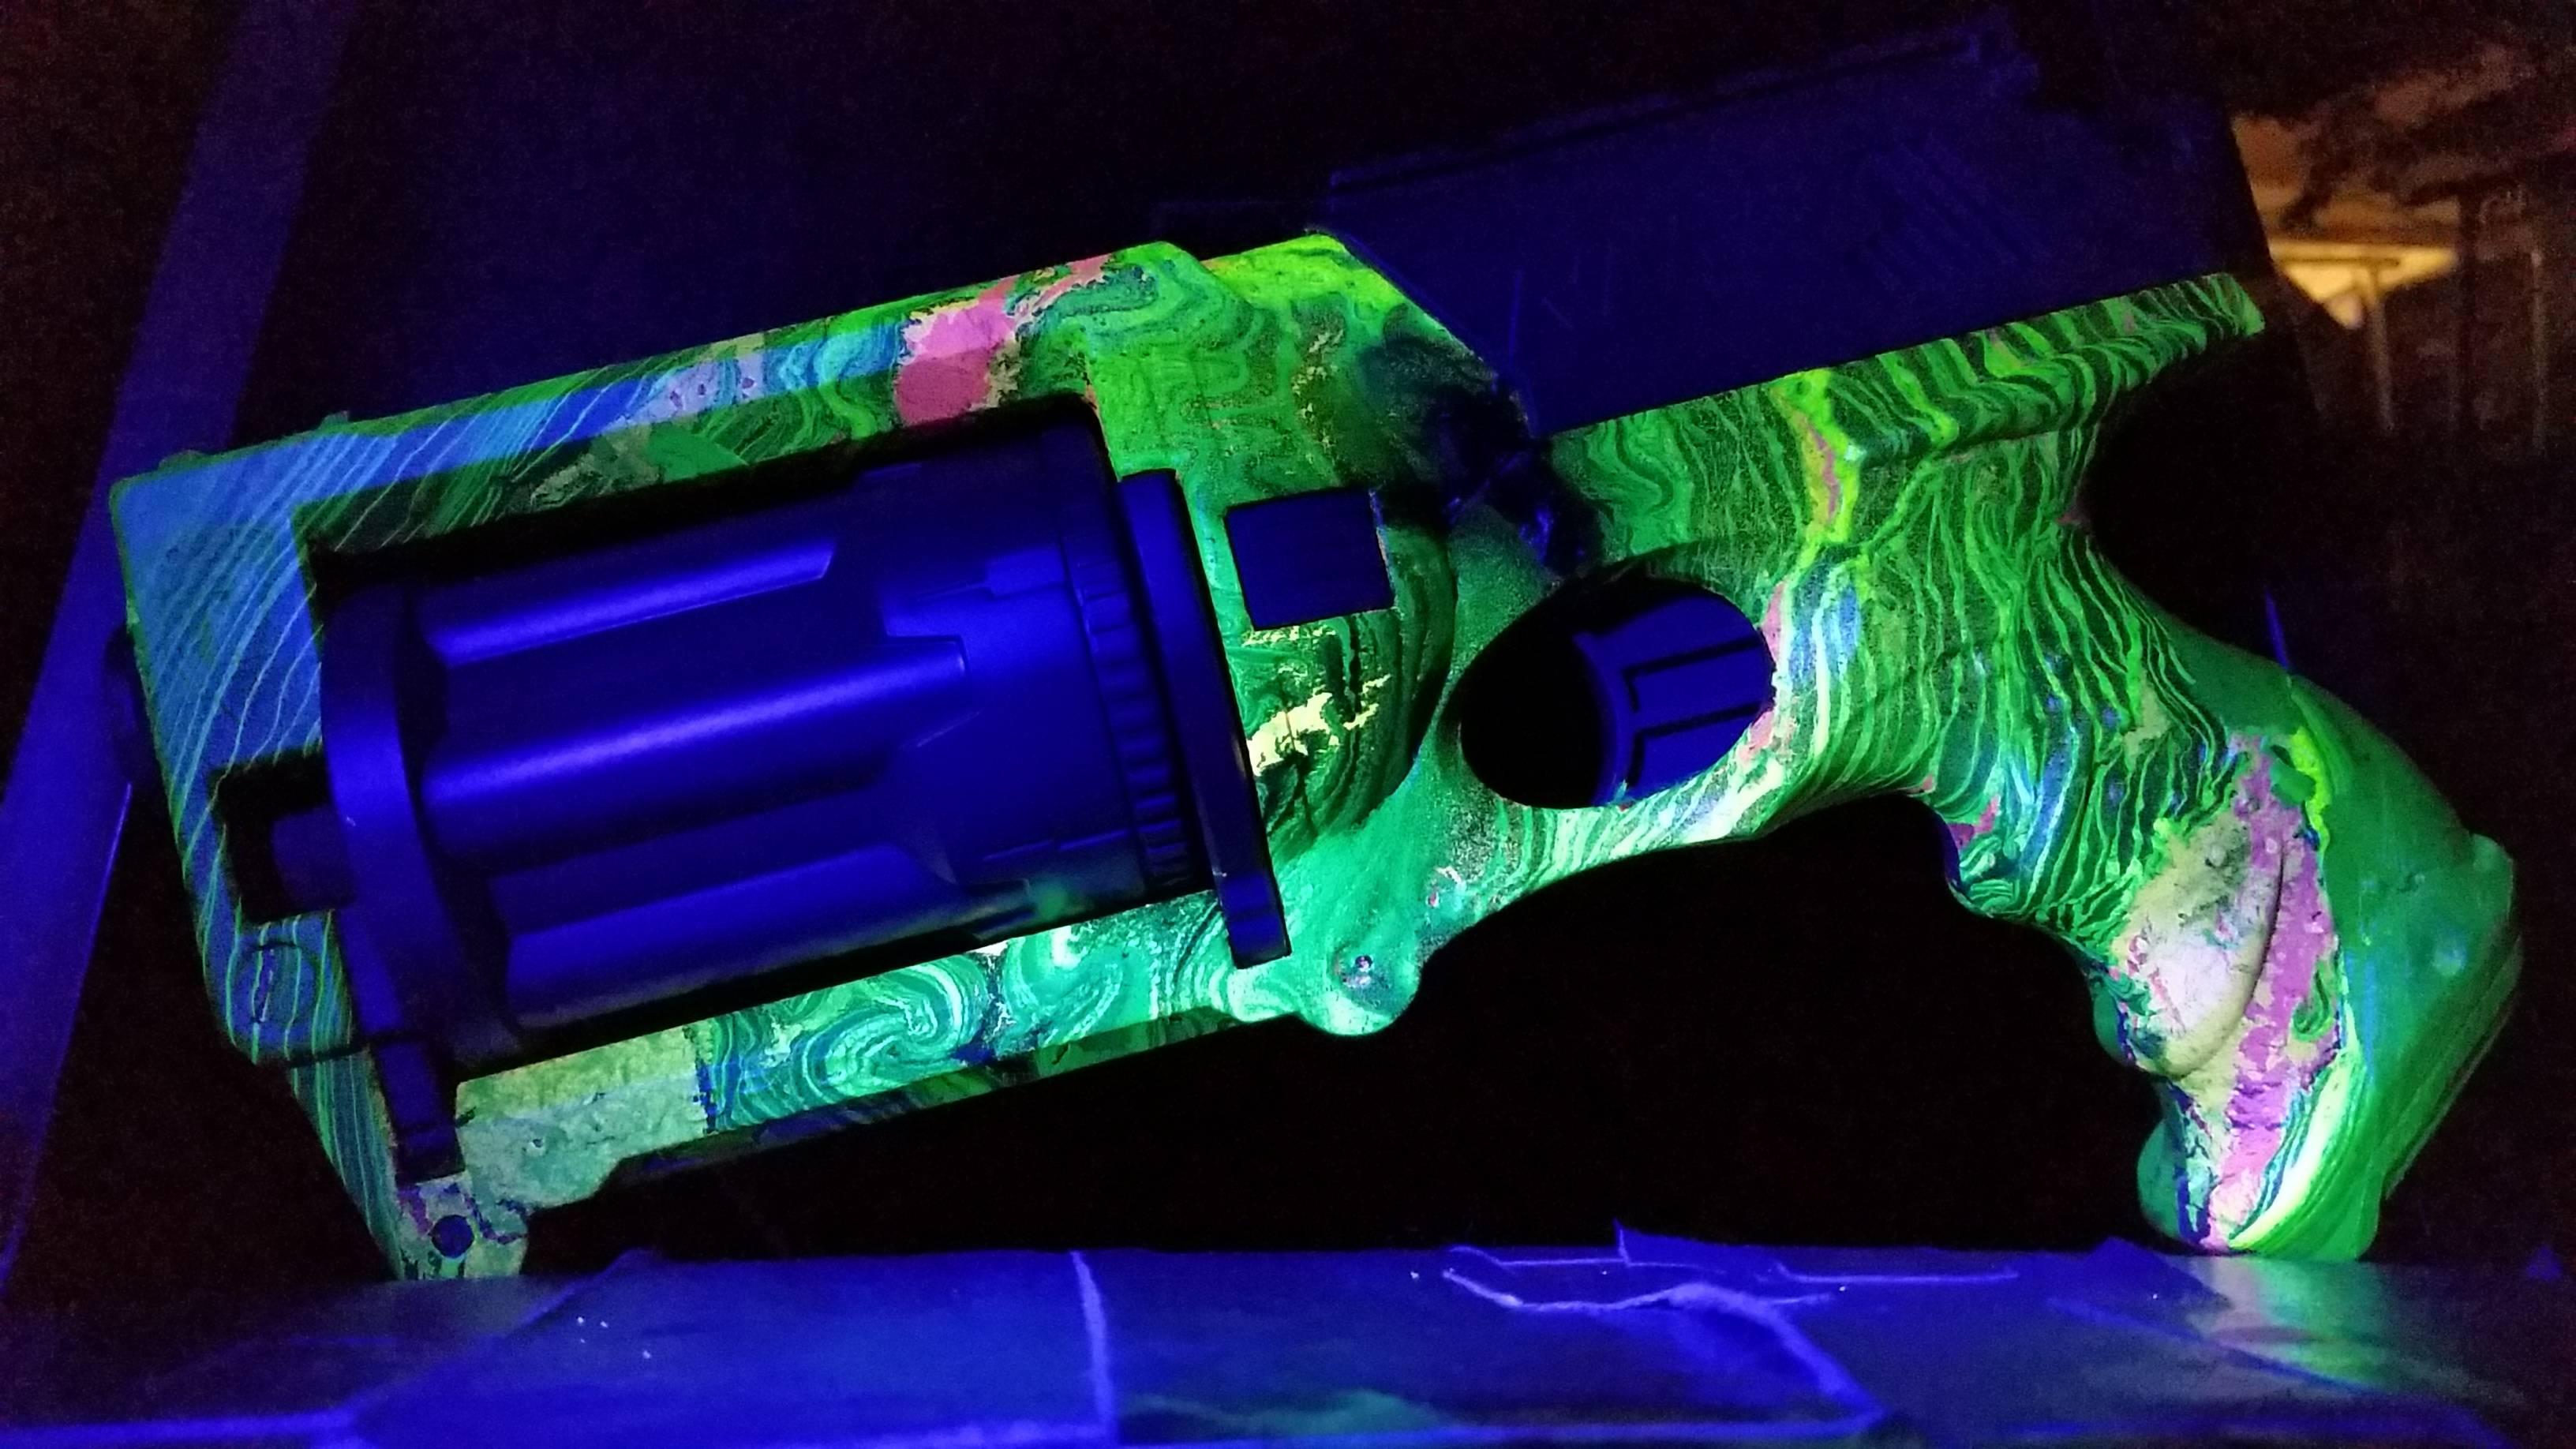 Colorful Hydro Swirl Ensign - Bathtub Design Ideas - valtak.com